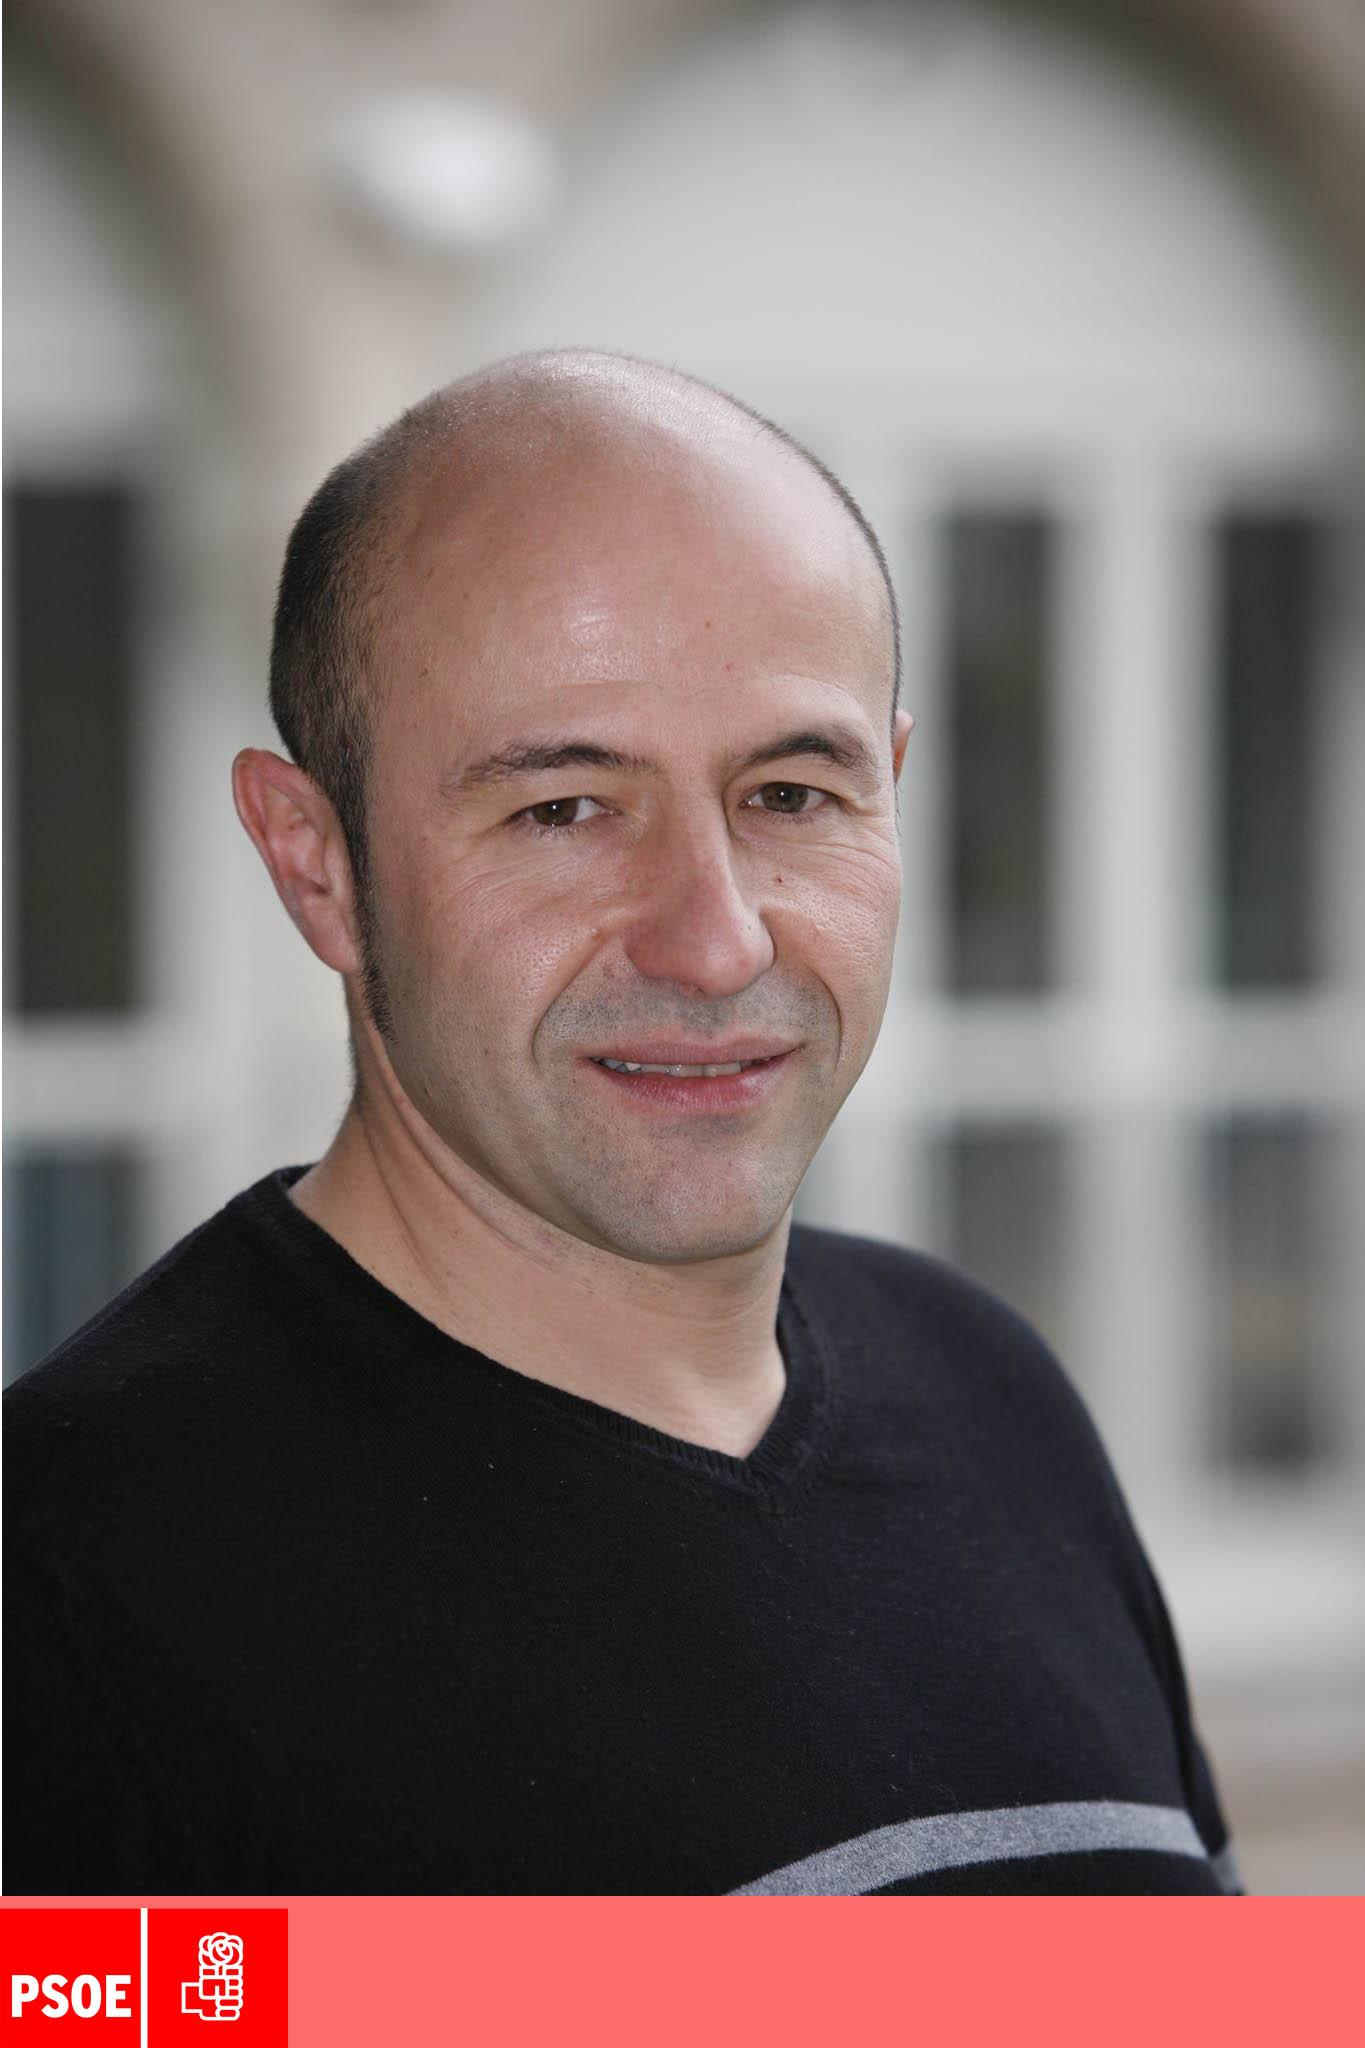 Jose Luis Olivares Melero - Jose-Luis-Olivares-Melero